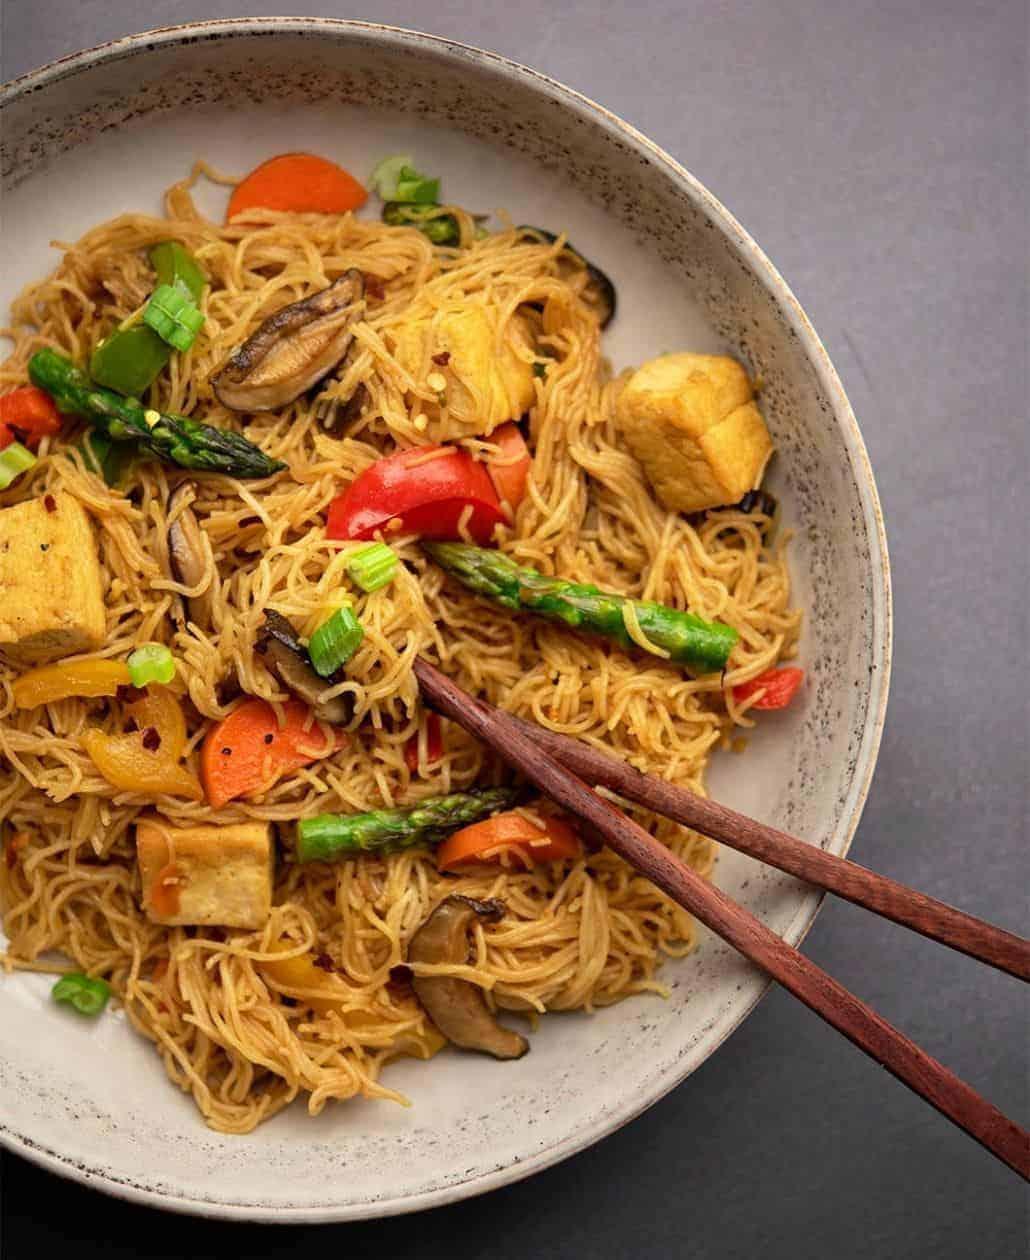 Singapore Mei Fun: This Easy Tofu & Vegetable Mei Fun Recipe Should Be Part of Your Vegan Rotation